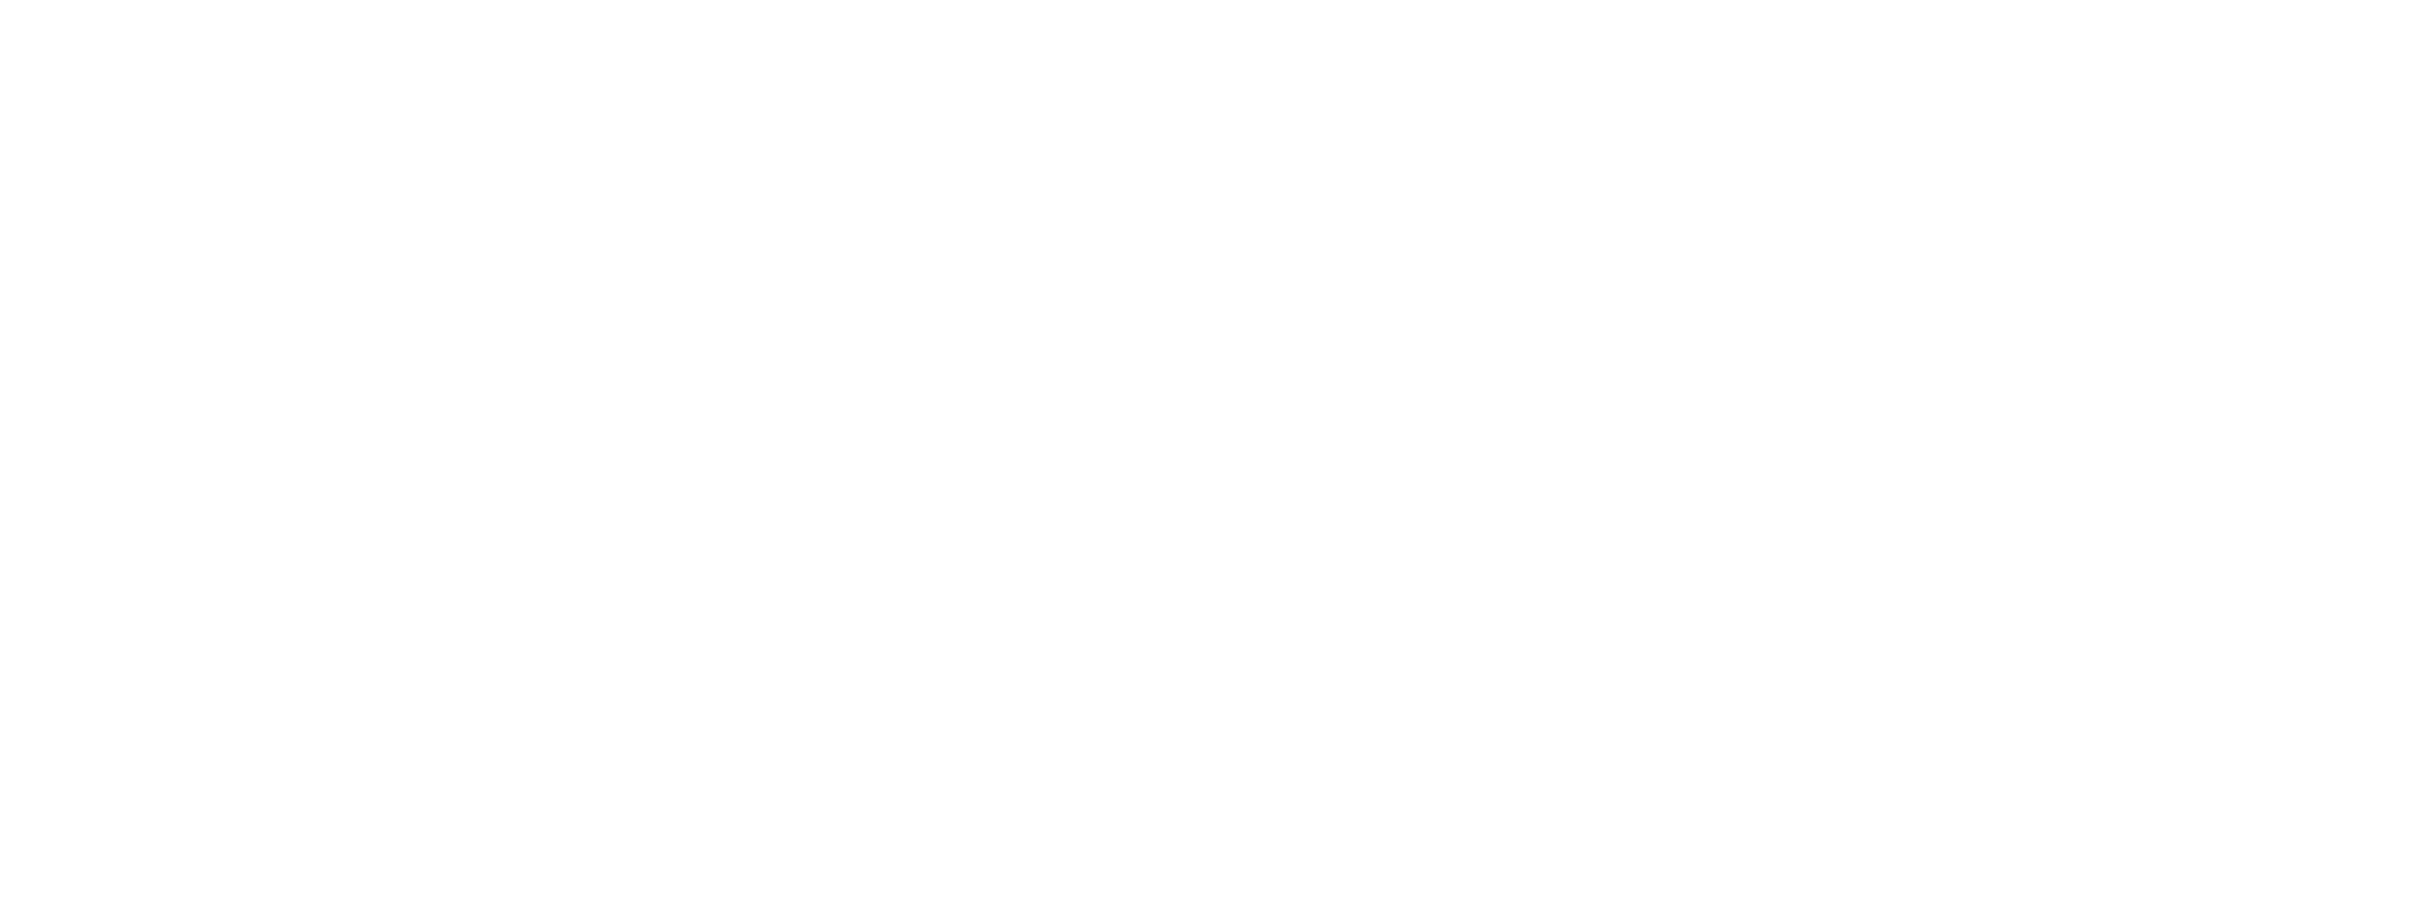 vide-plan